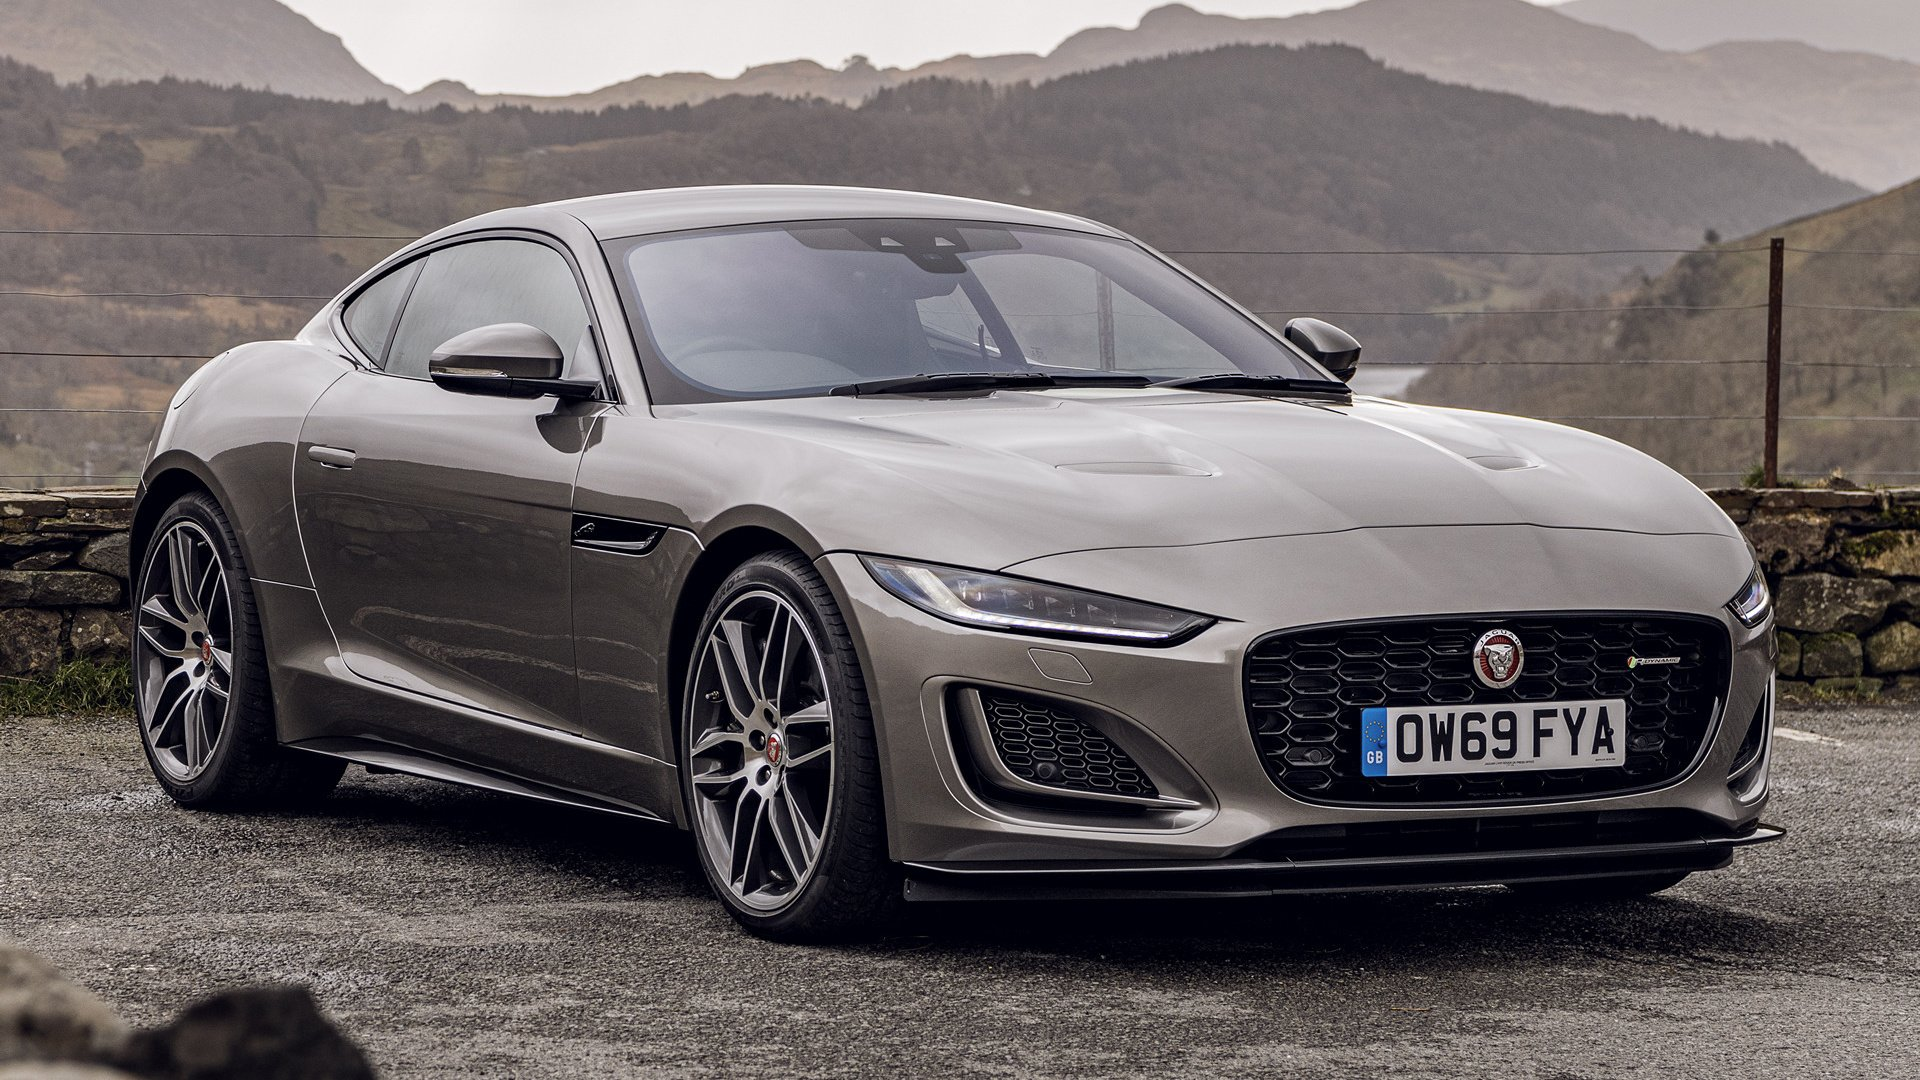 2020 jaguar f-type p 450 coupe r-dynamic hd wallpaper